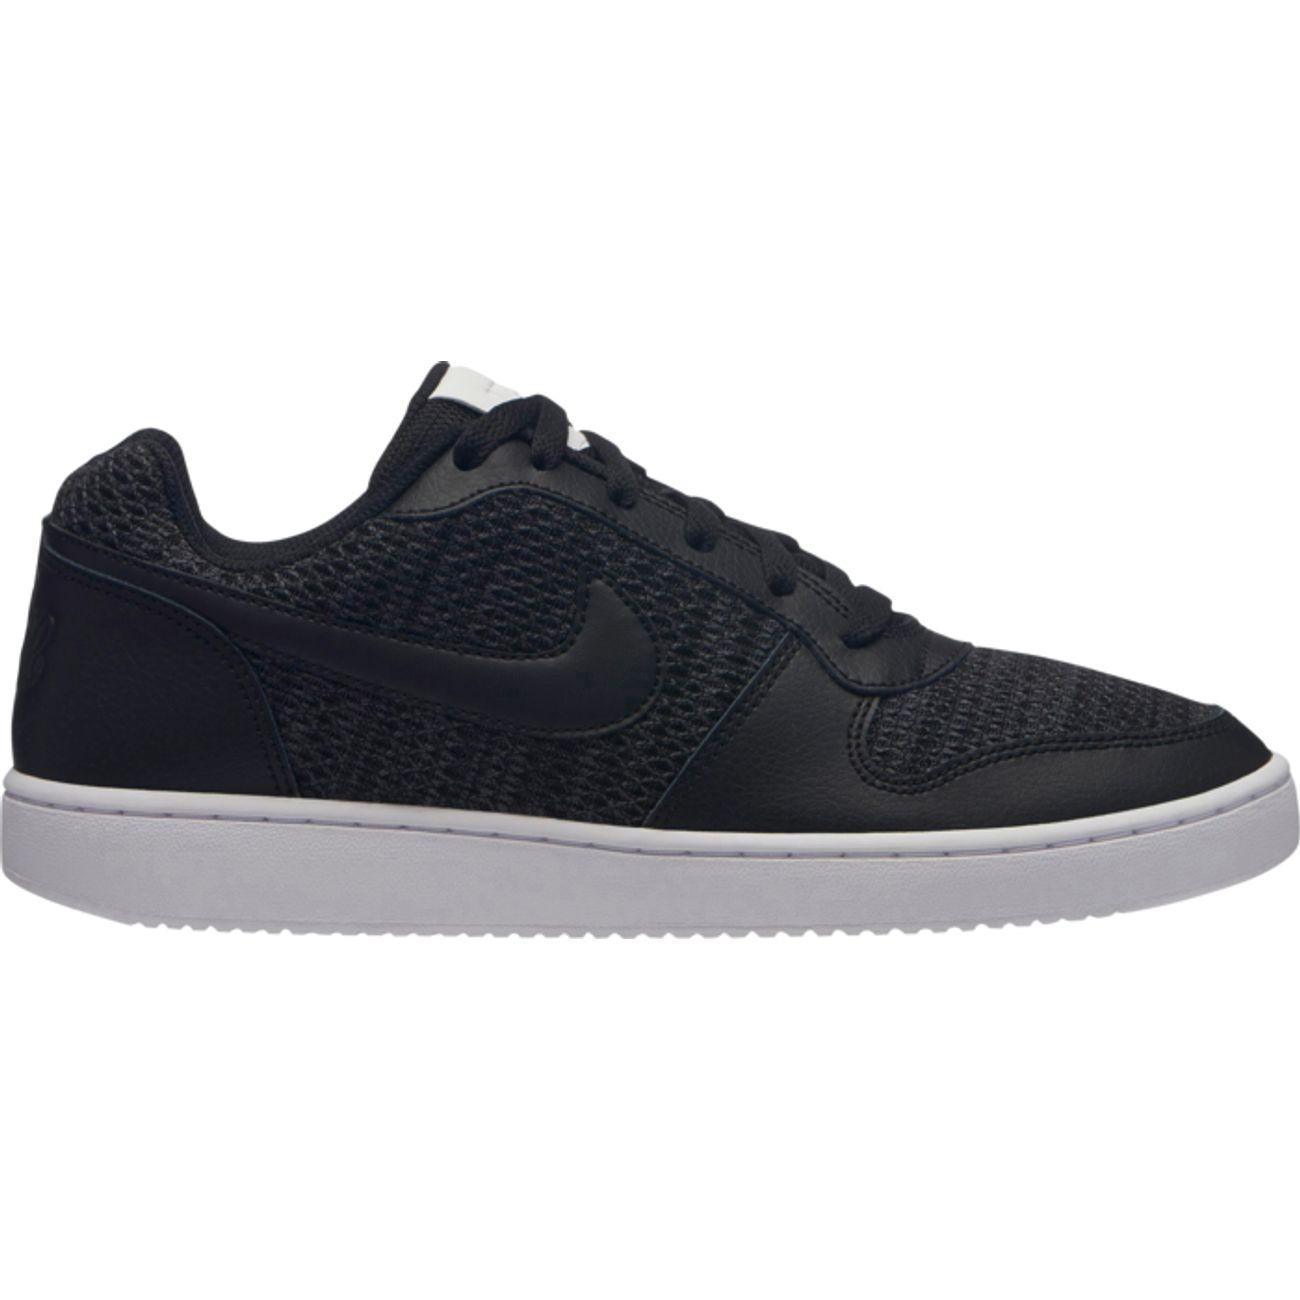 Nike Ebernon Low – achat pas cher GO Sport